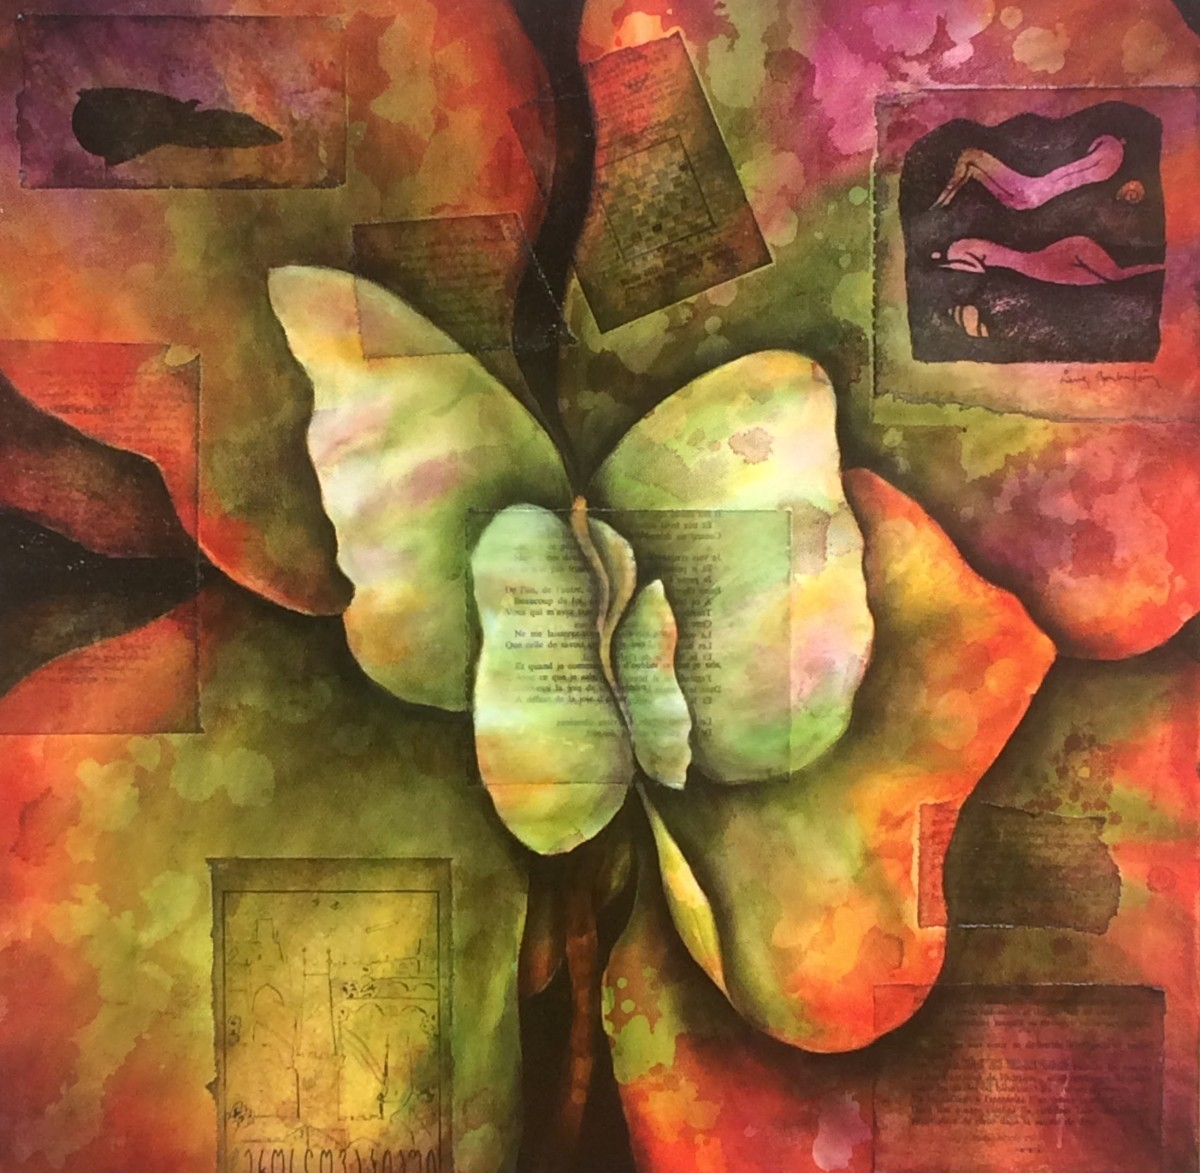 Libiretto by Ansley Pye